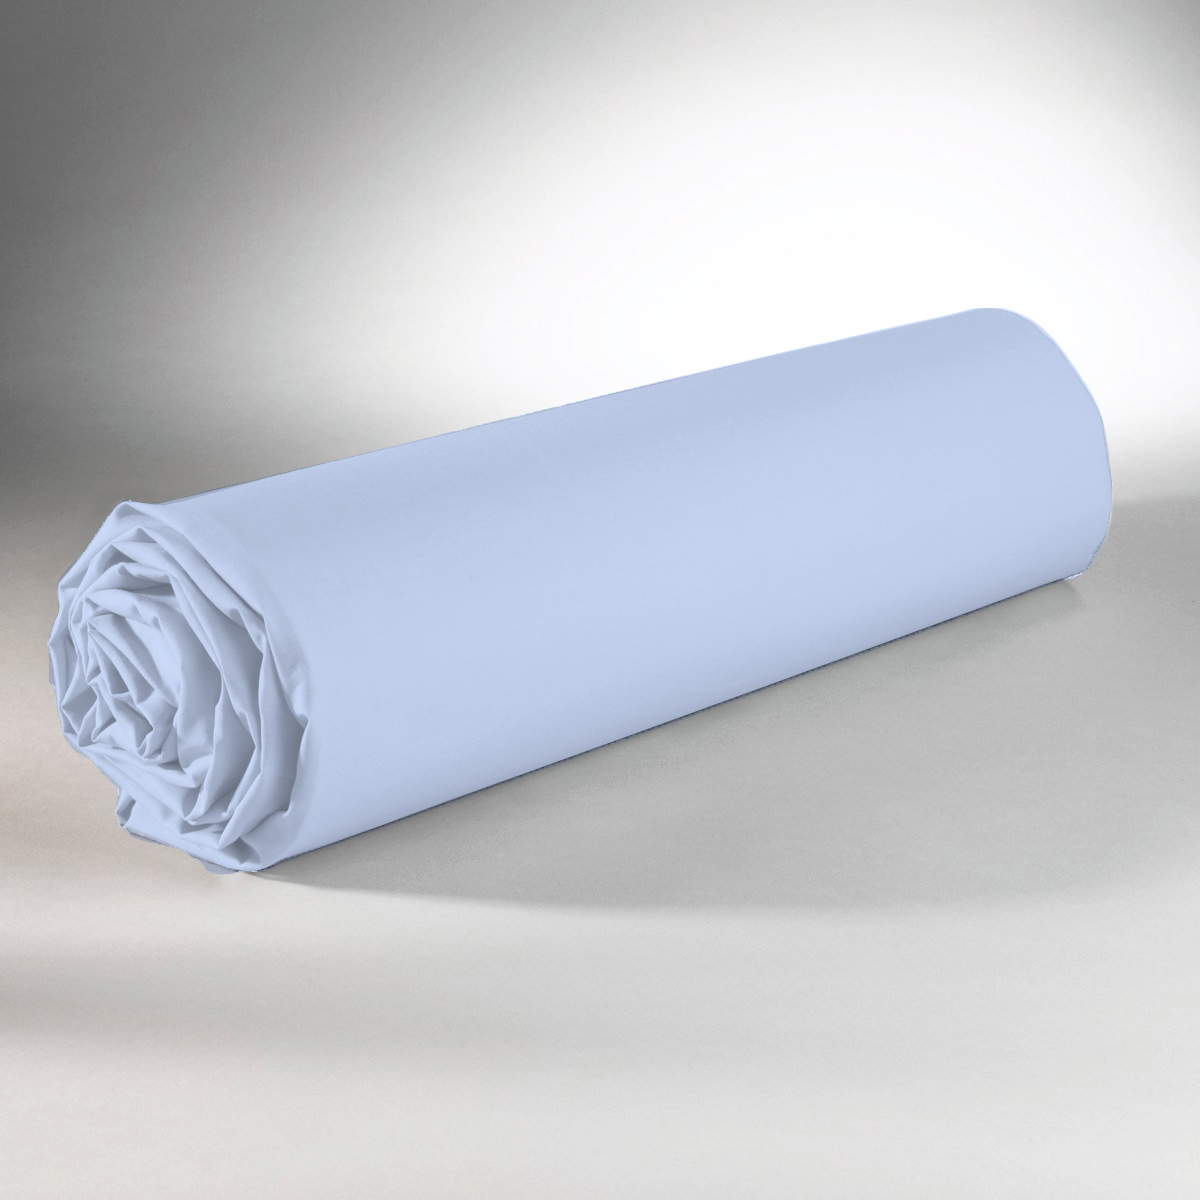 Drap housse 100% coton 140x190+25 bleu clair